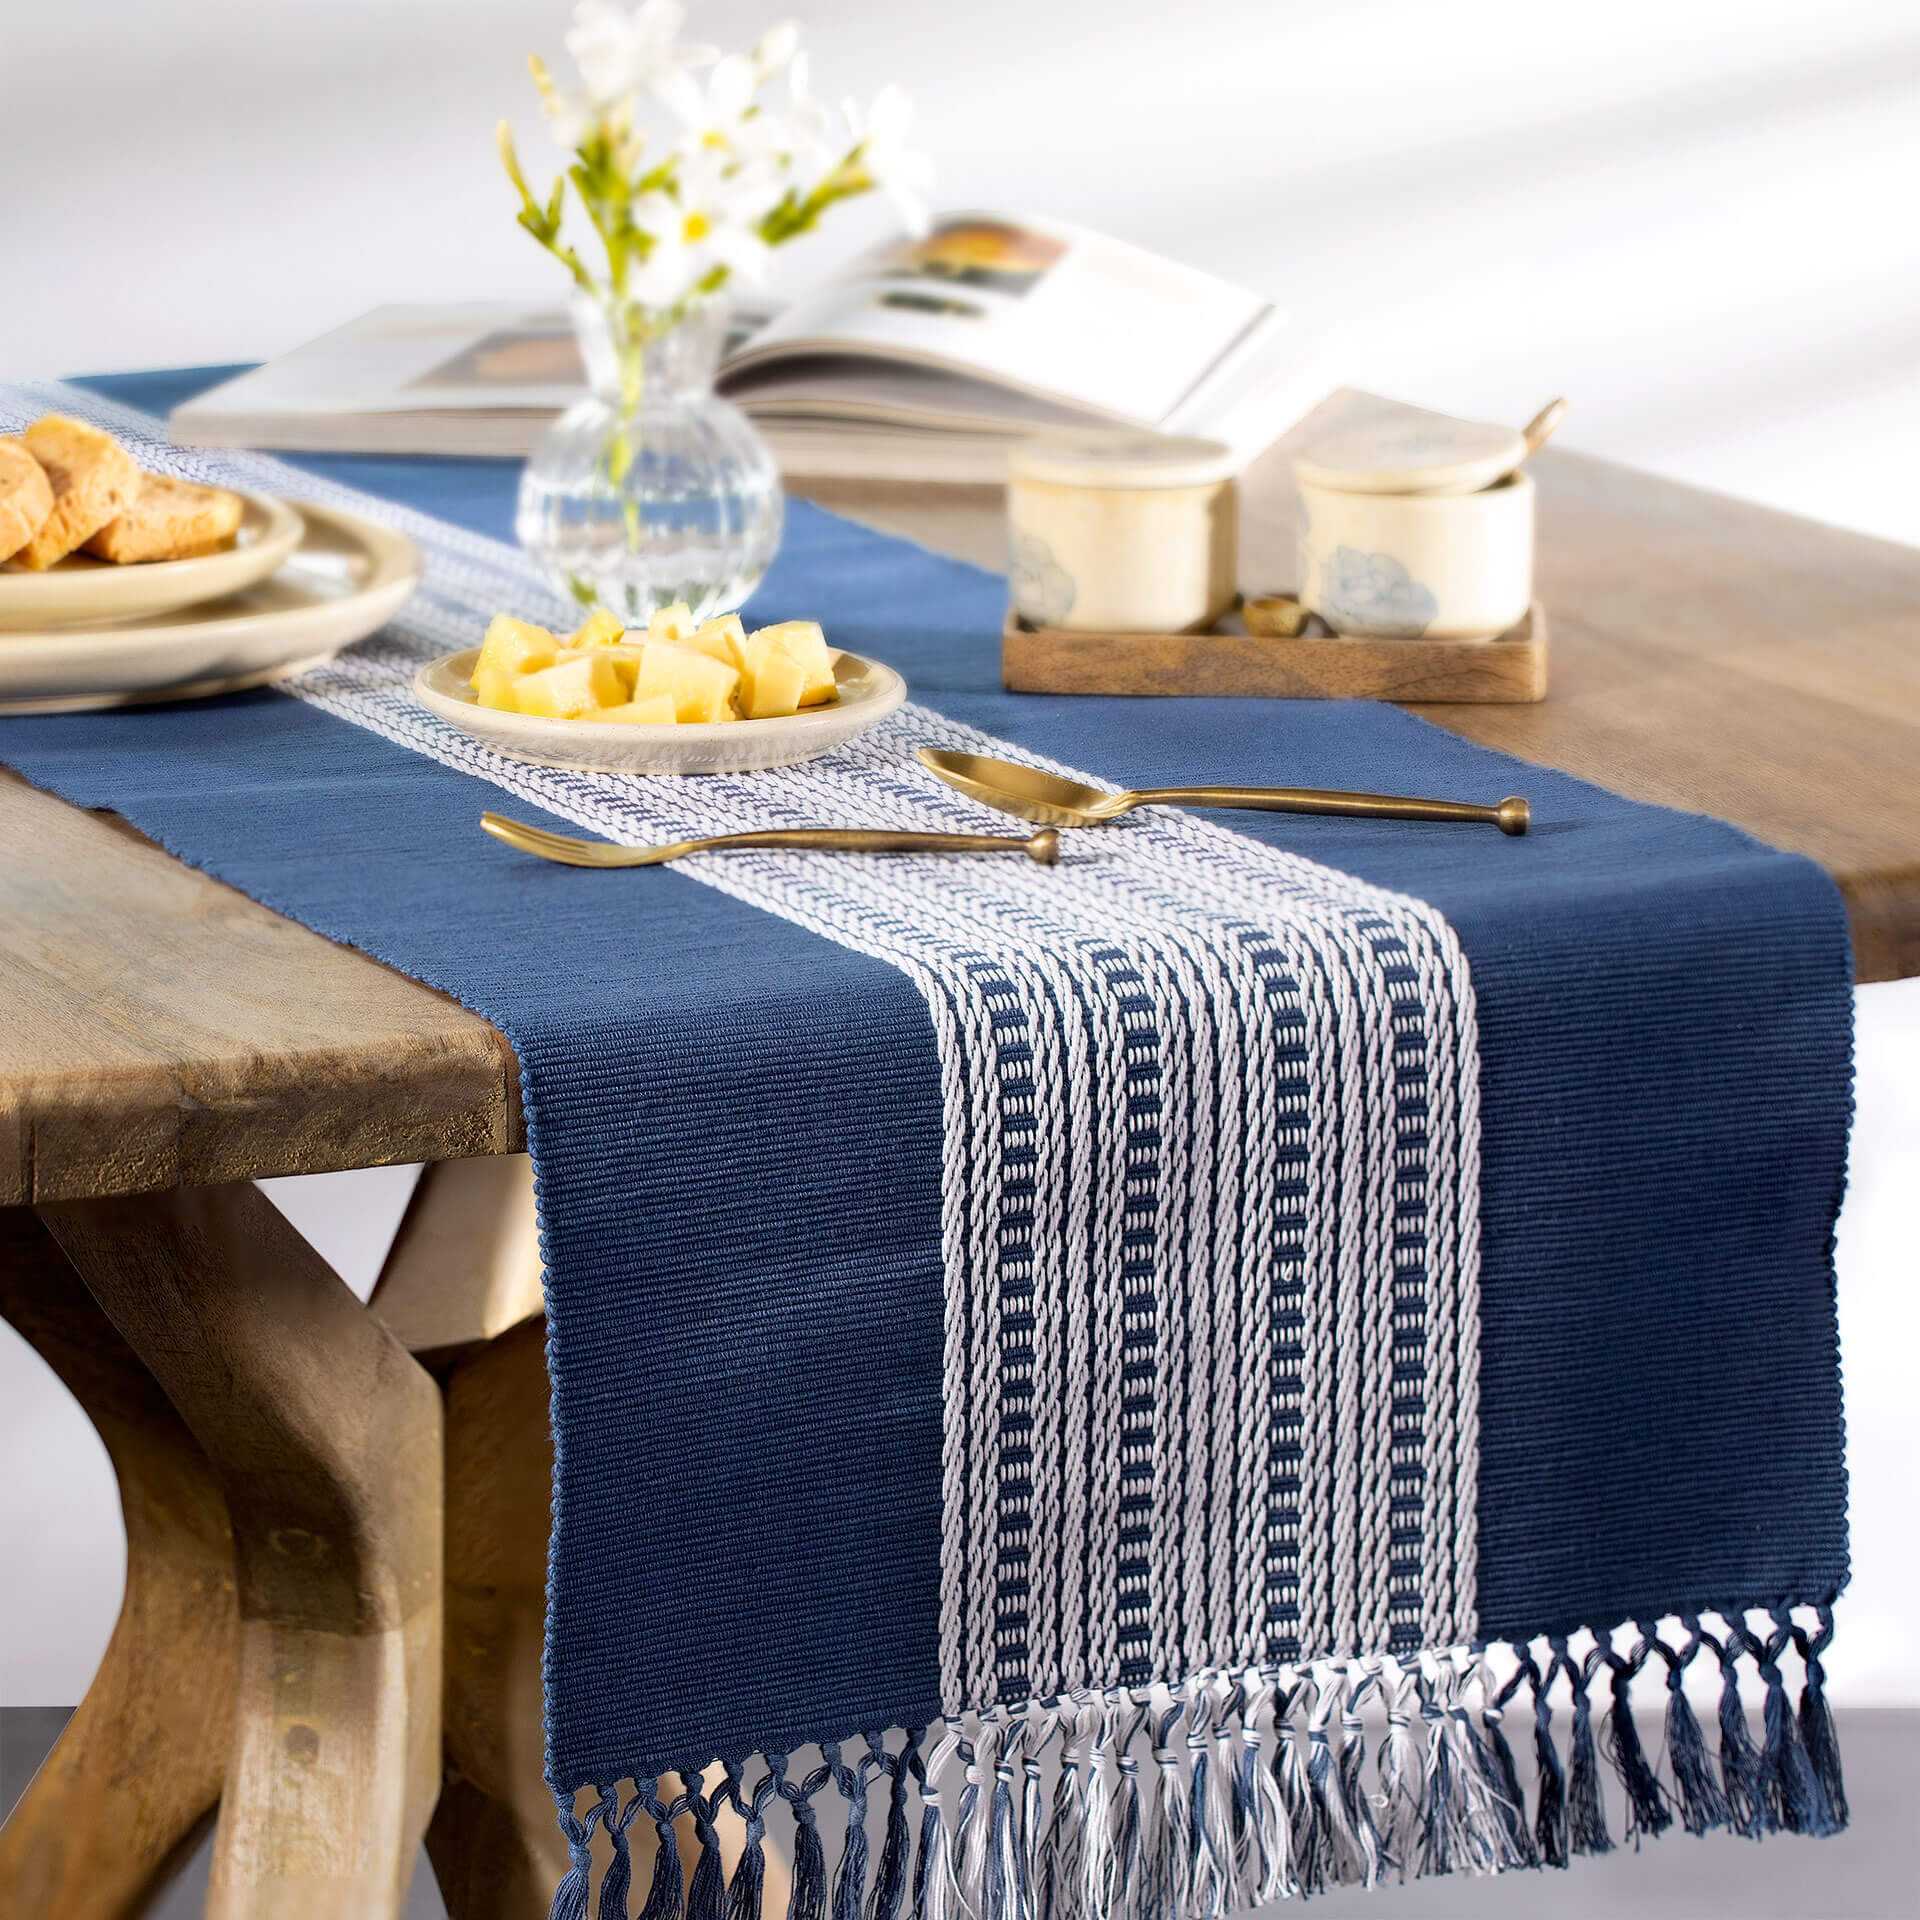 Aksa 100% Cotton Table Runner - Ellementry